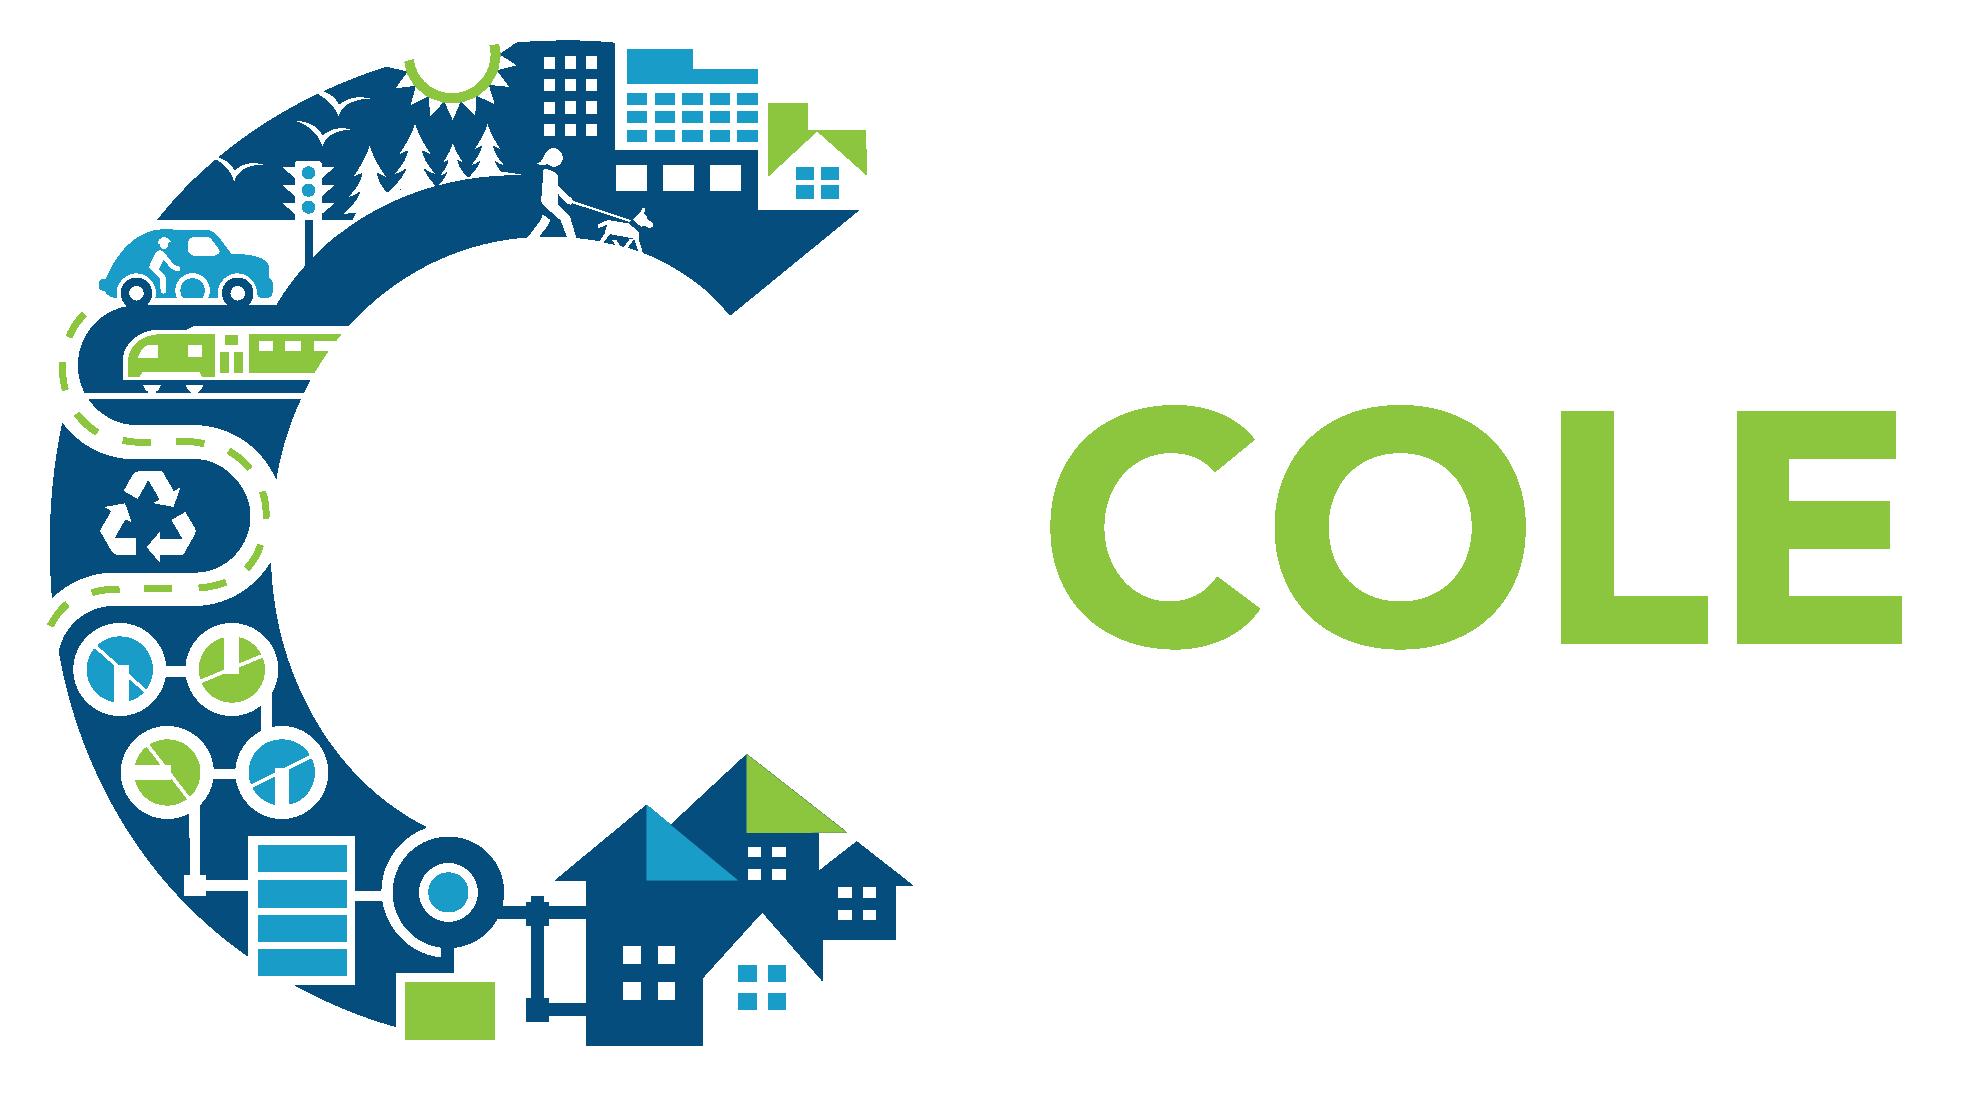 yre_cole-new-logo-blue-green